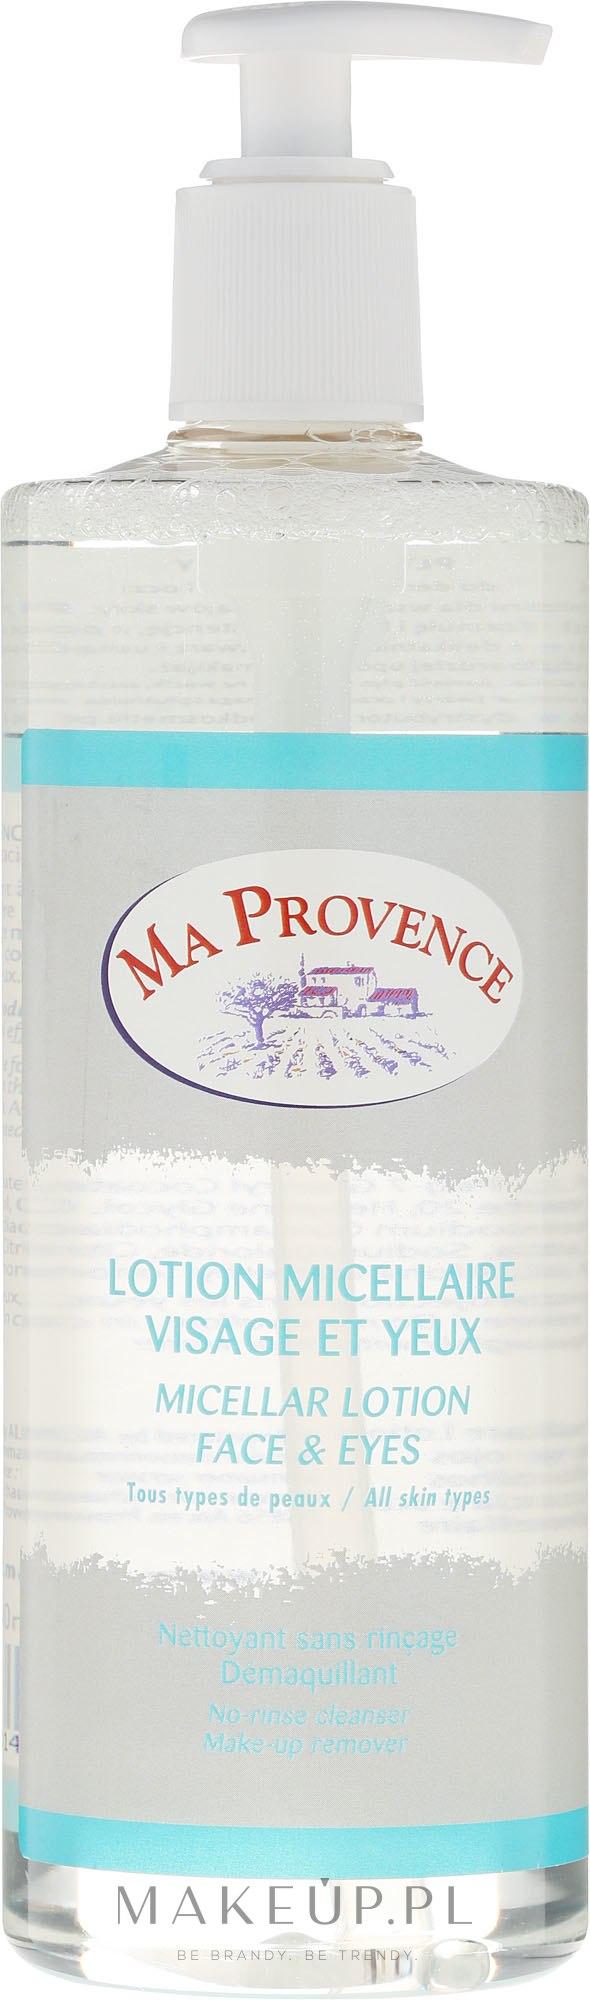 Płyn micelarny do demakijażu twarzy i oczu - Ma Provence Micellar Lotion Face & Eyes — фото 500 ml